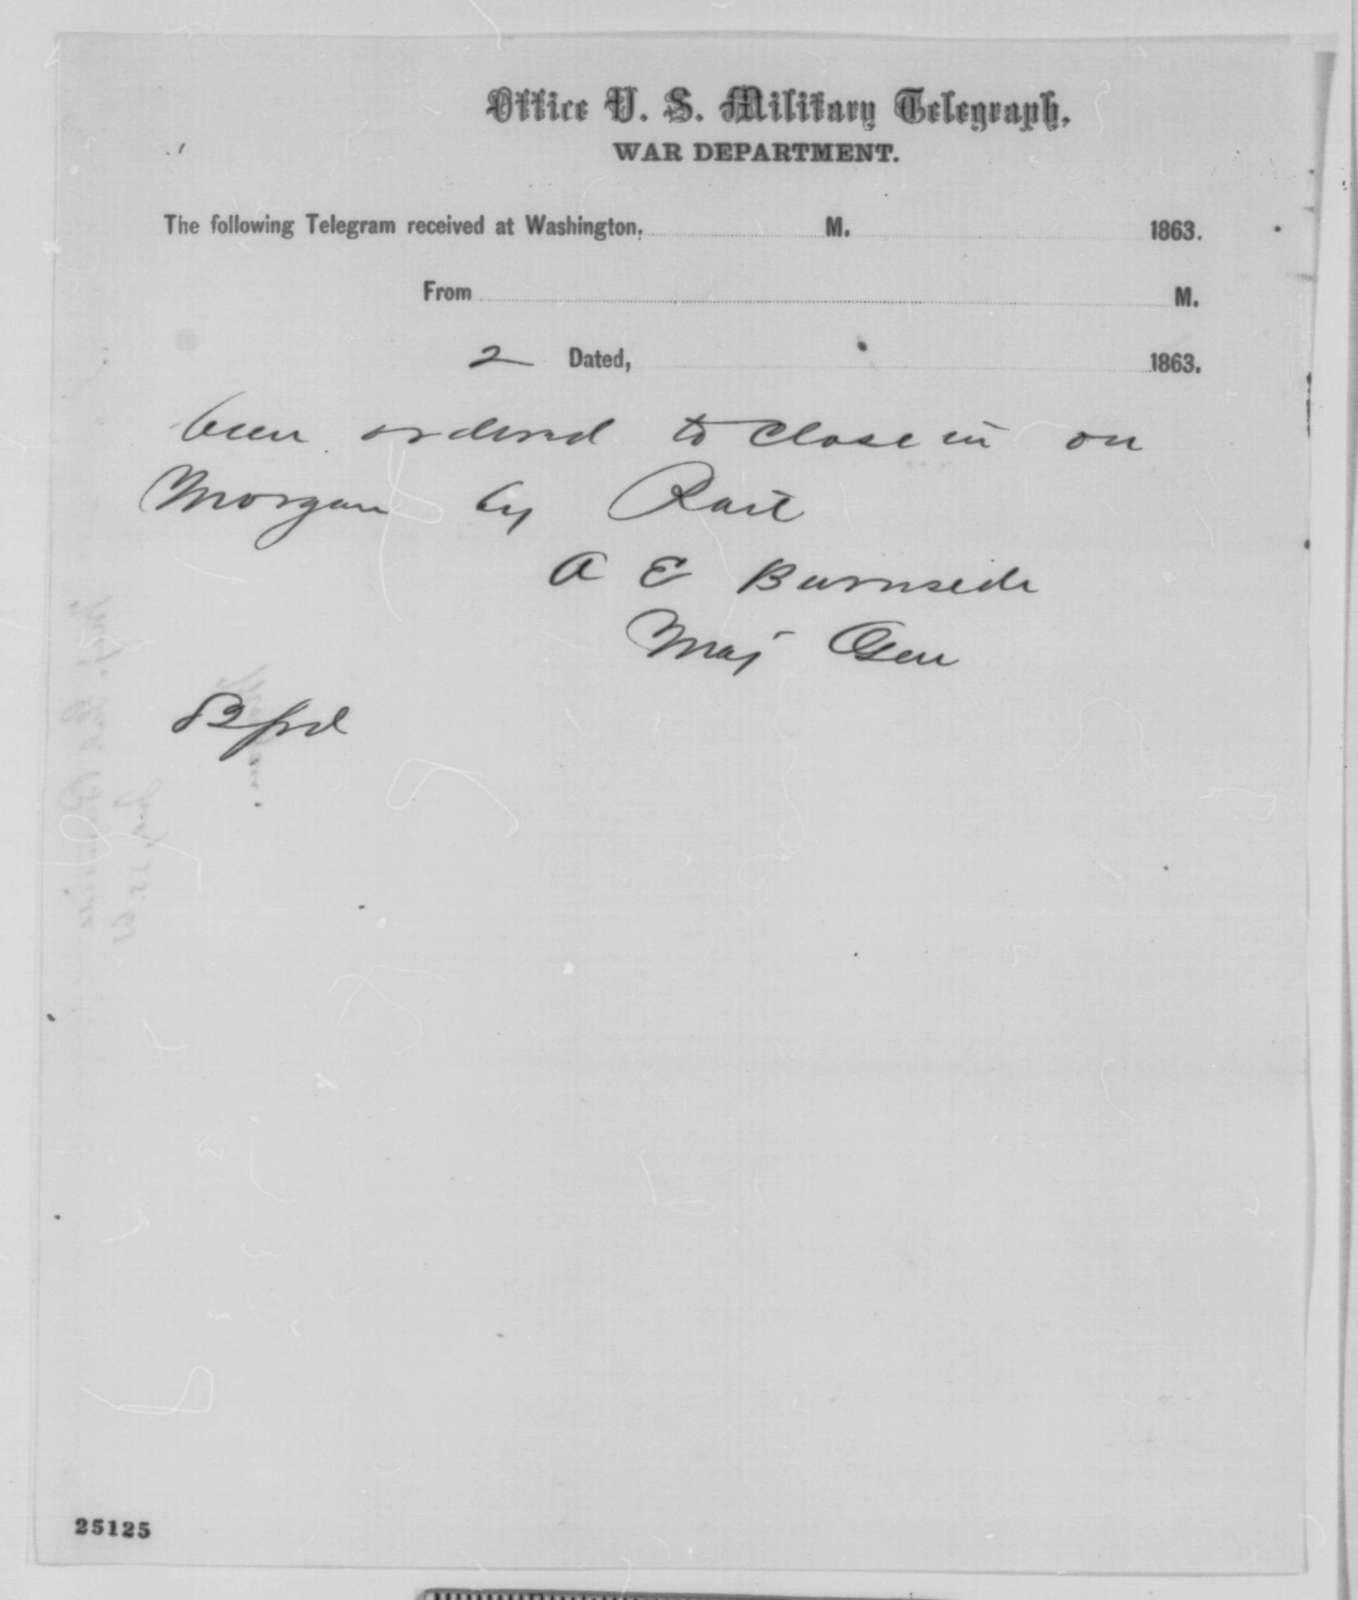 Ambrose E. Burnside to Abraham Lincoln, Saturday, July 25, 1863  (Telegram reporting location of John Morgan)